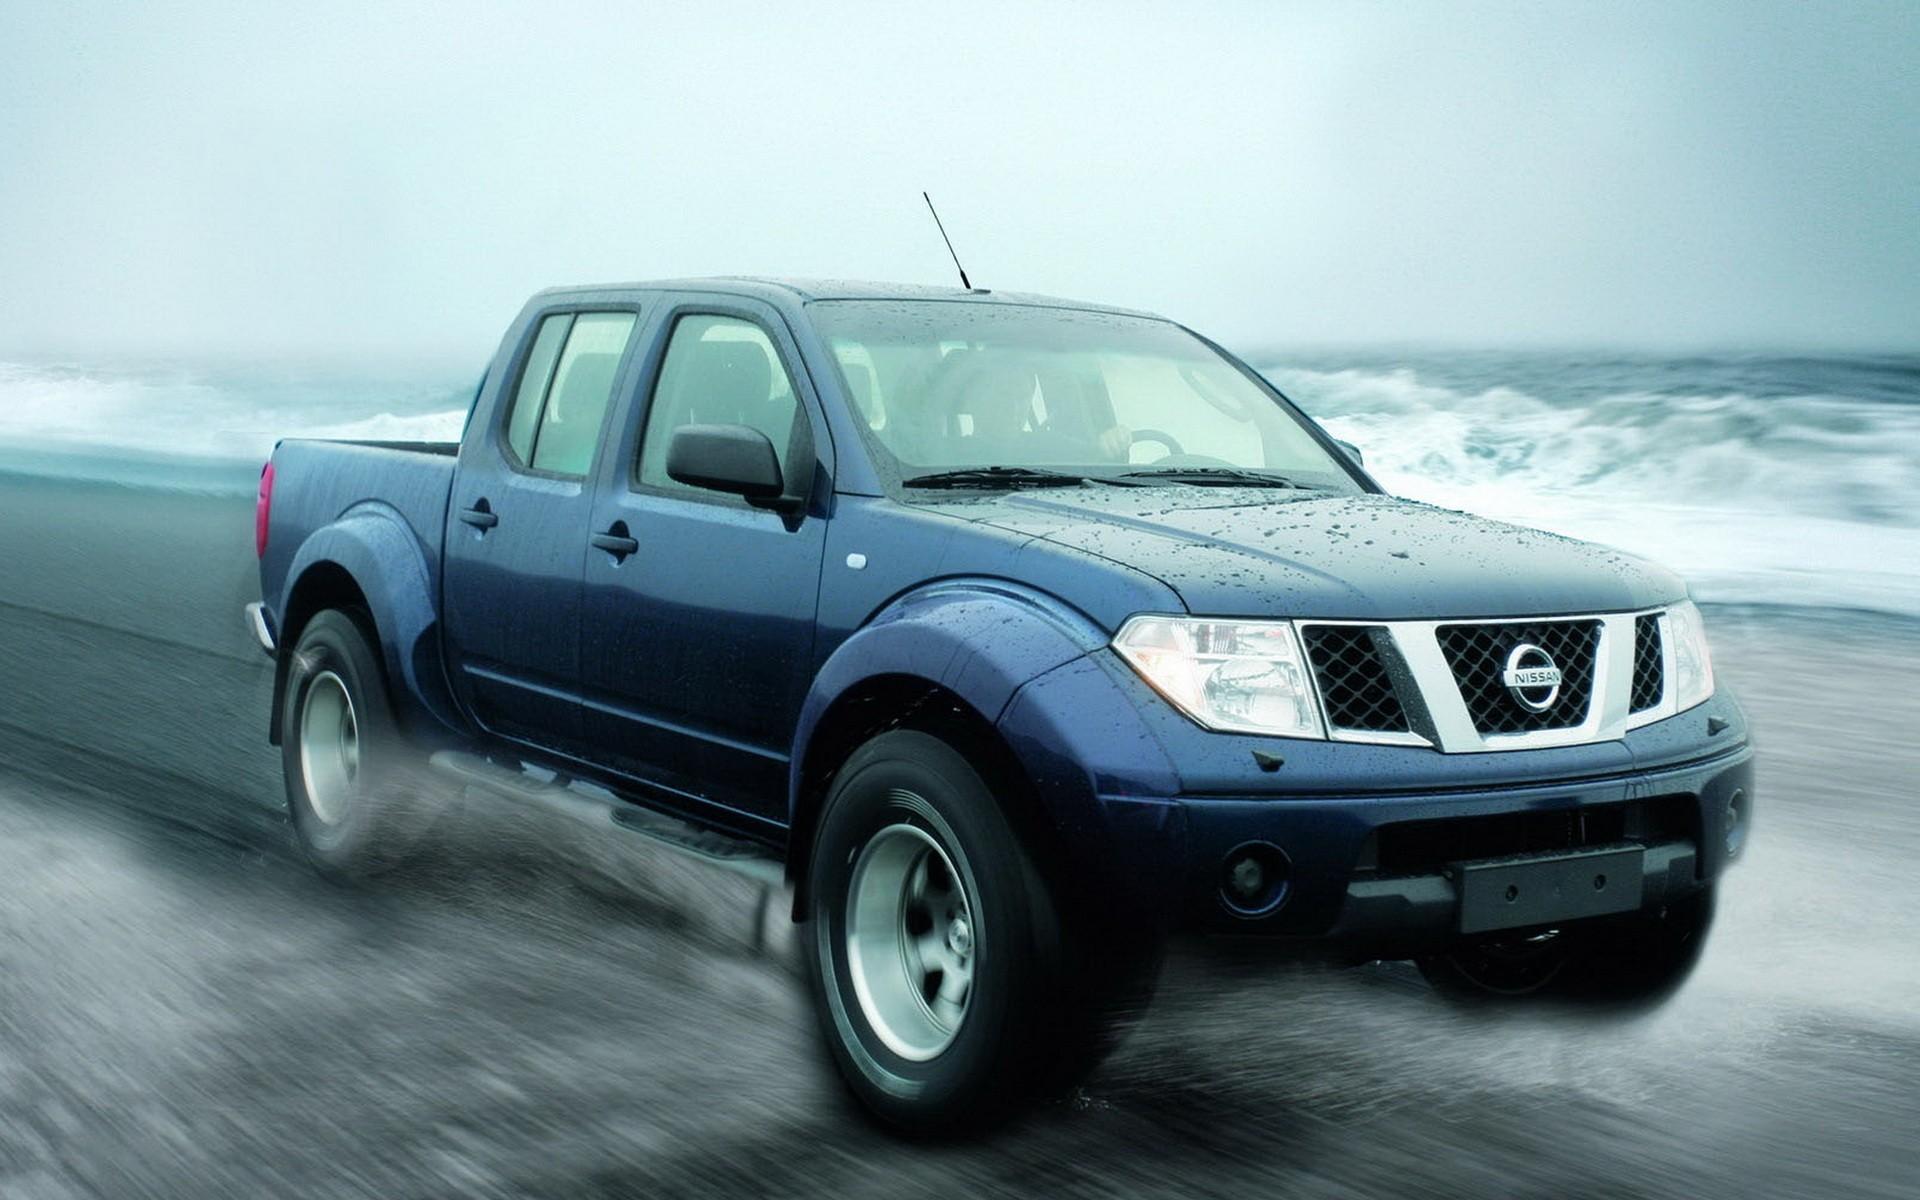 Pickup Nissan azul - 1920x1200